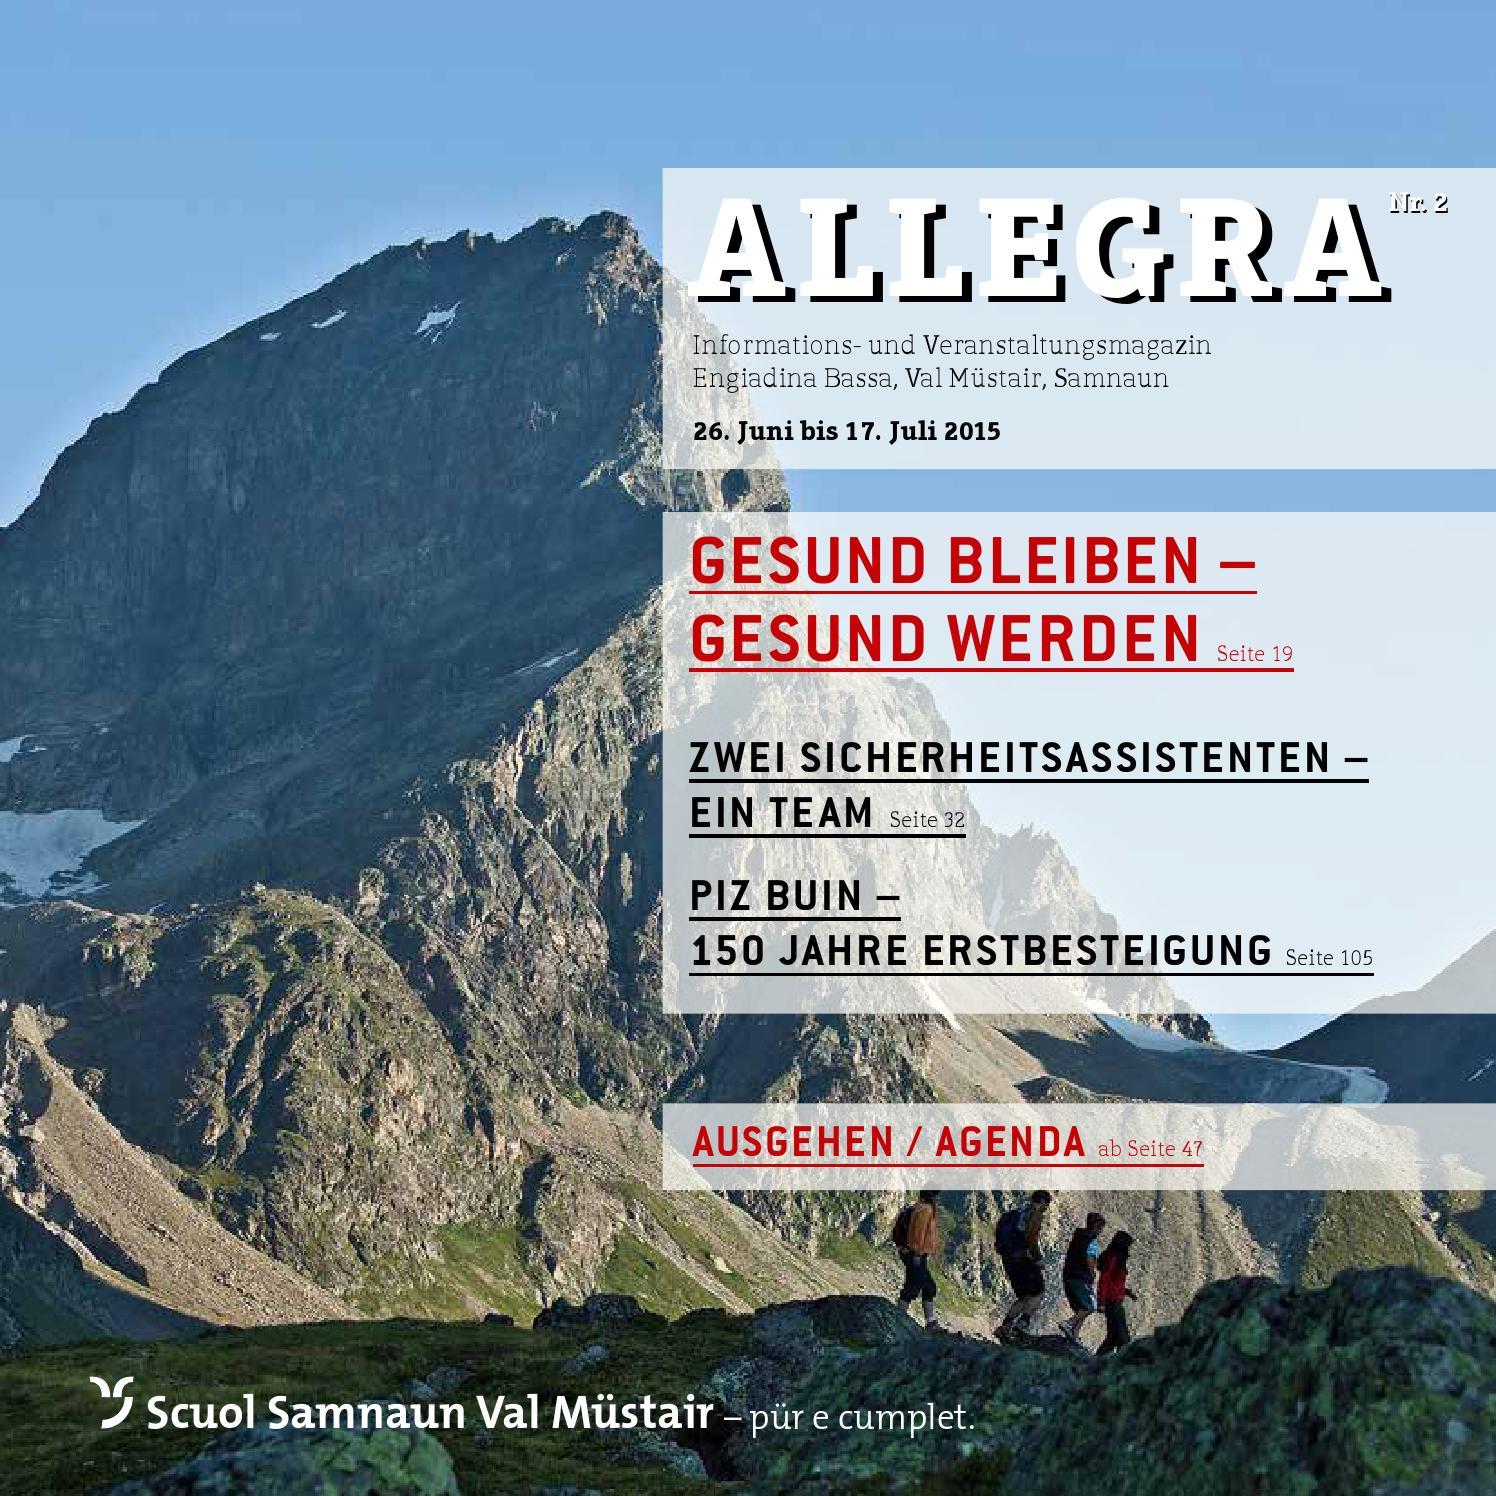 Allegra - Nr. 10/2019 by Tourismus Engadin Scuol Samnaun